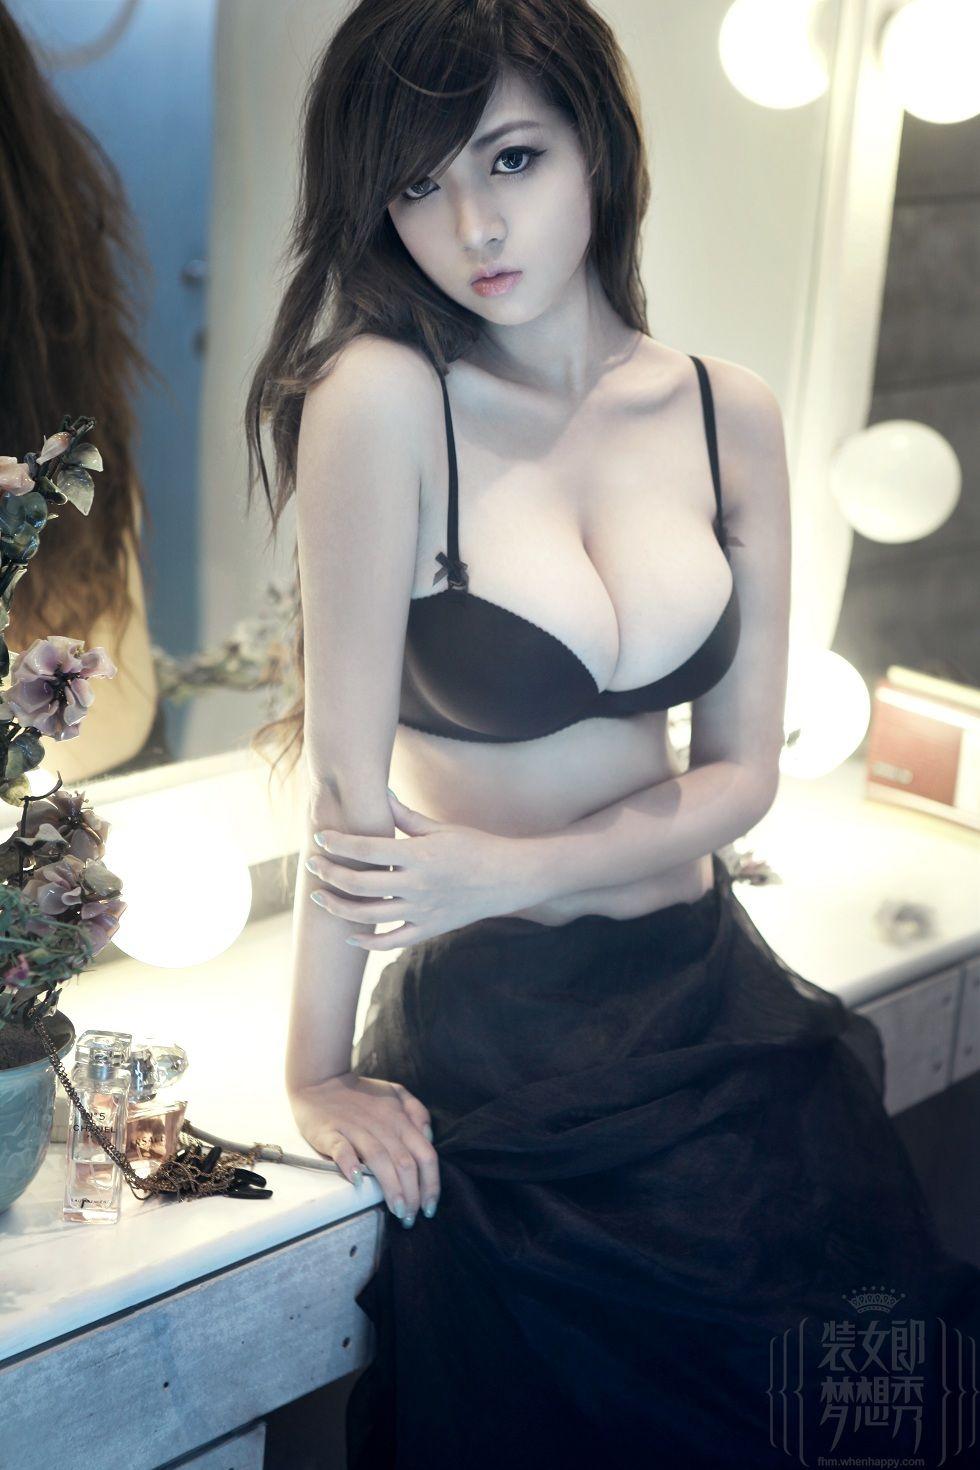 Chinese boobs photos